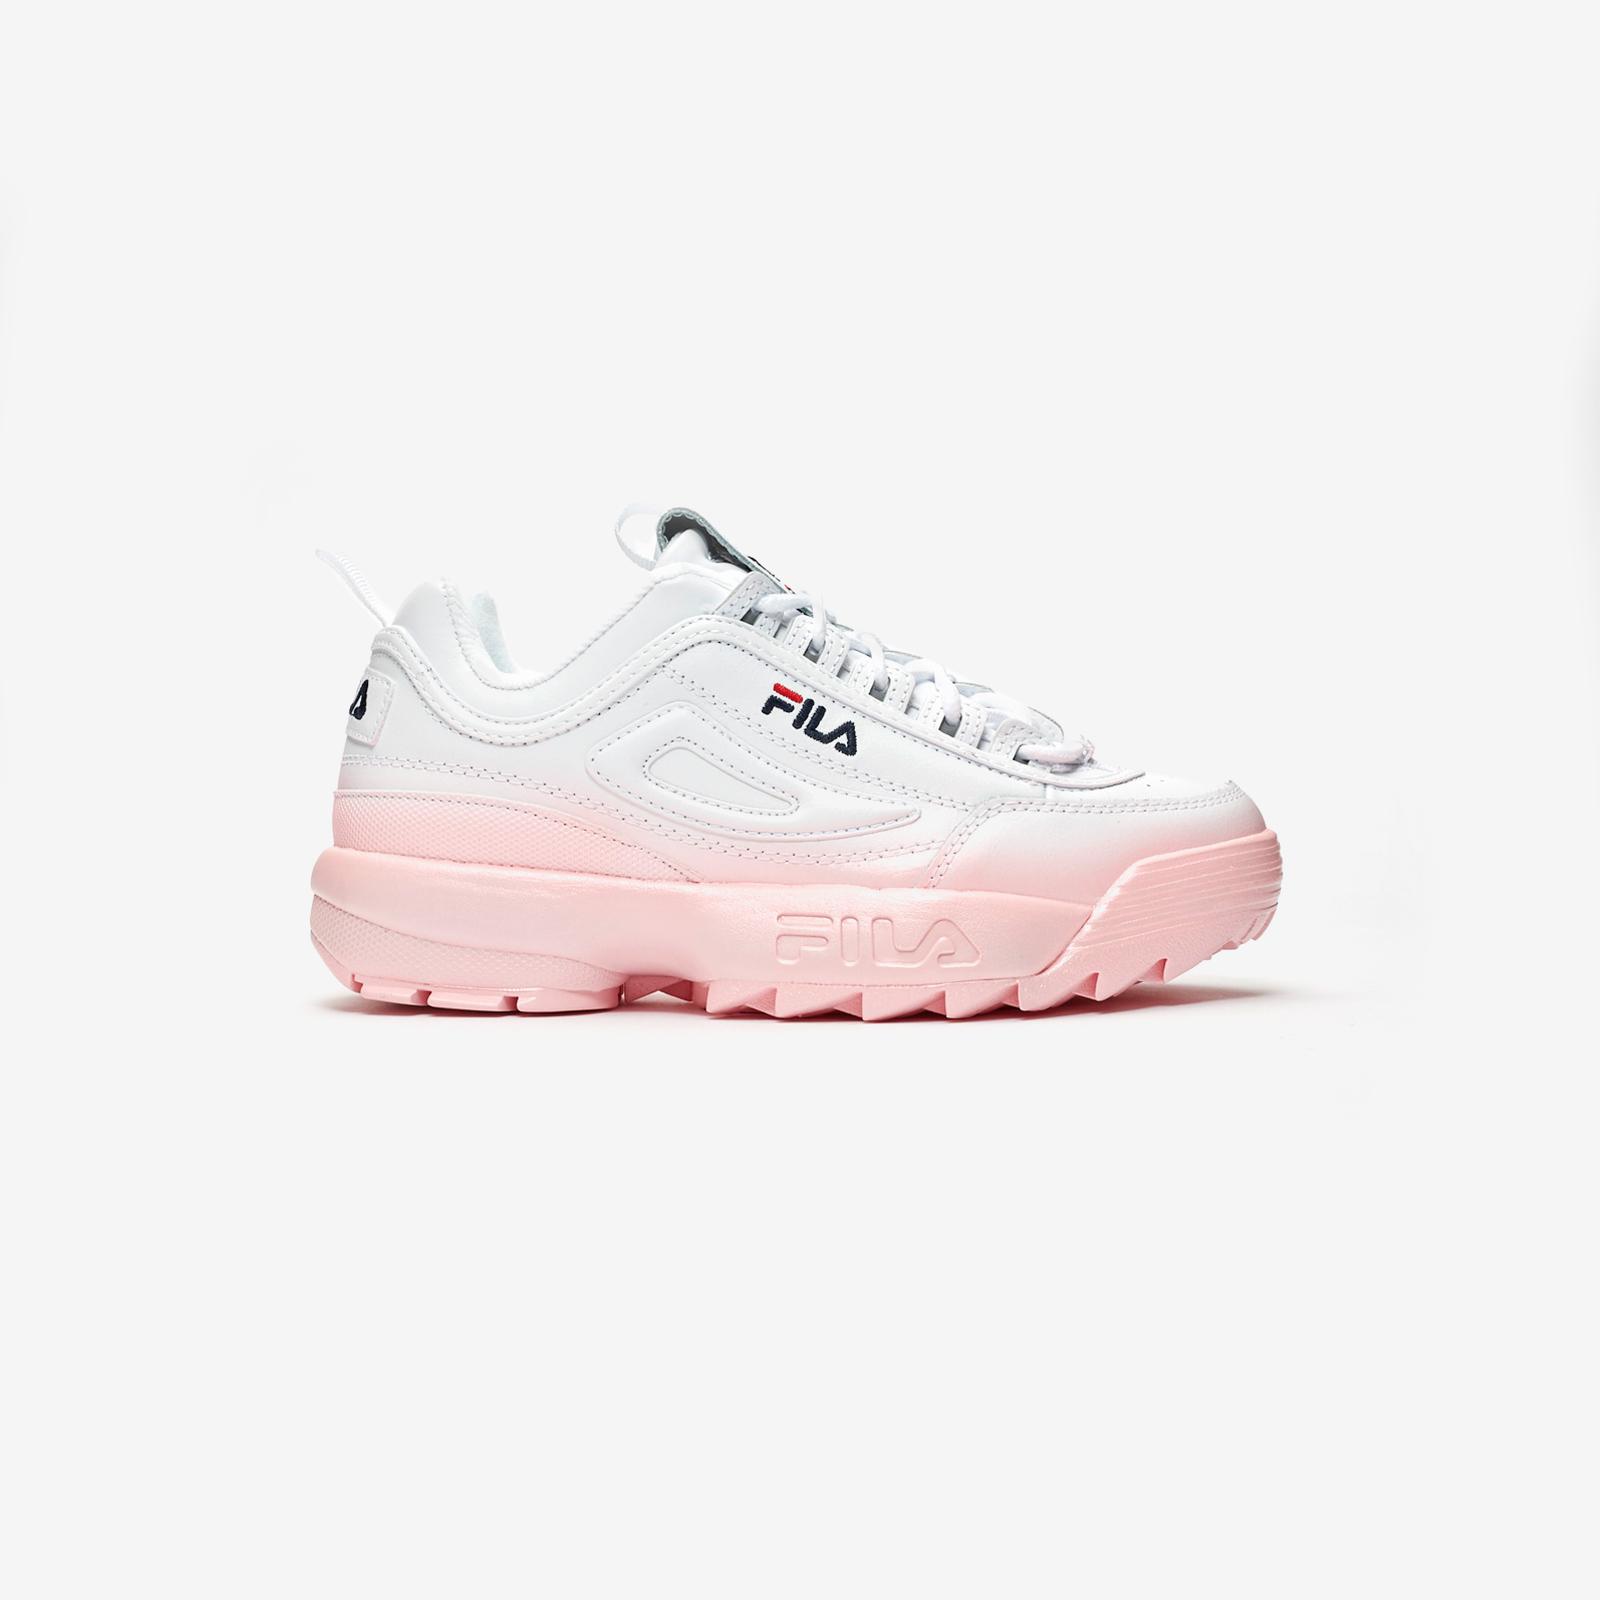 Fila Disruptor II Premium Fade - 5fm00541-156 - Sneakersnstuff I ...